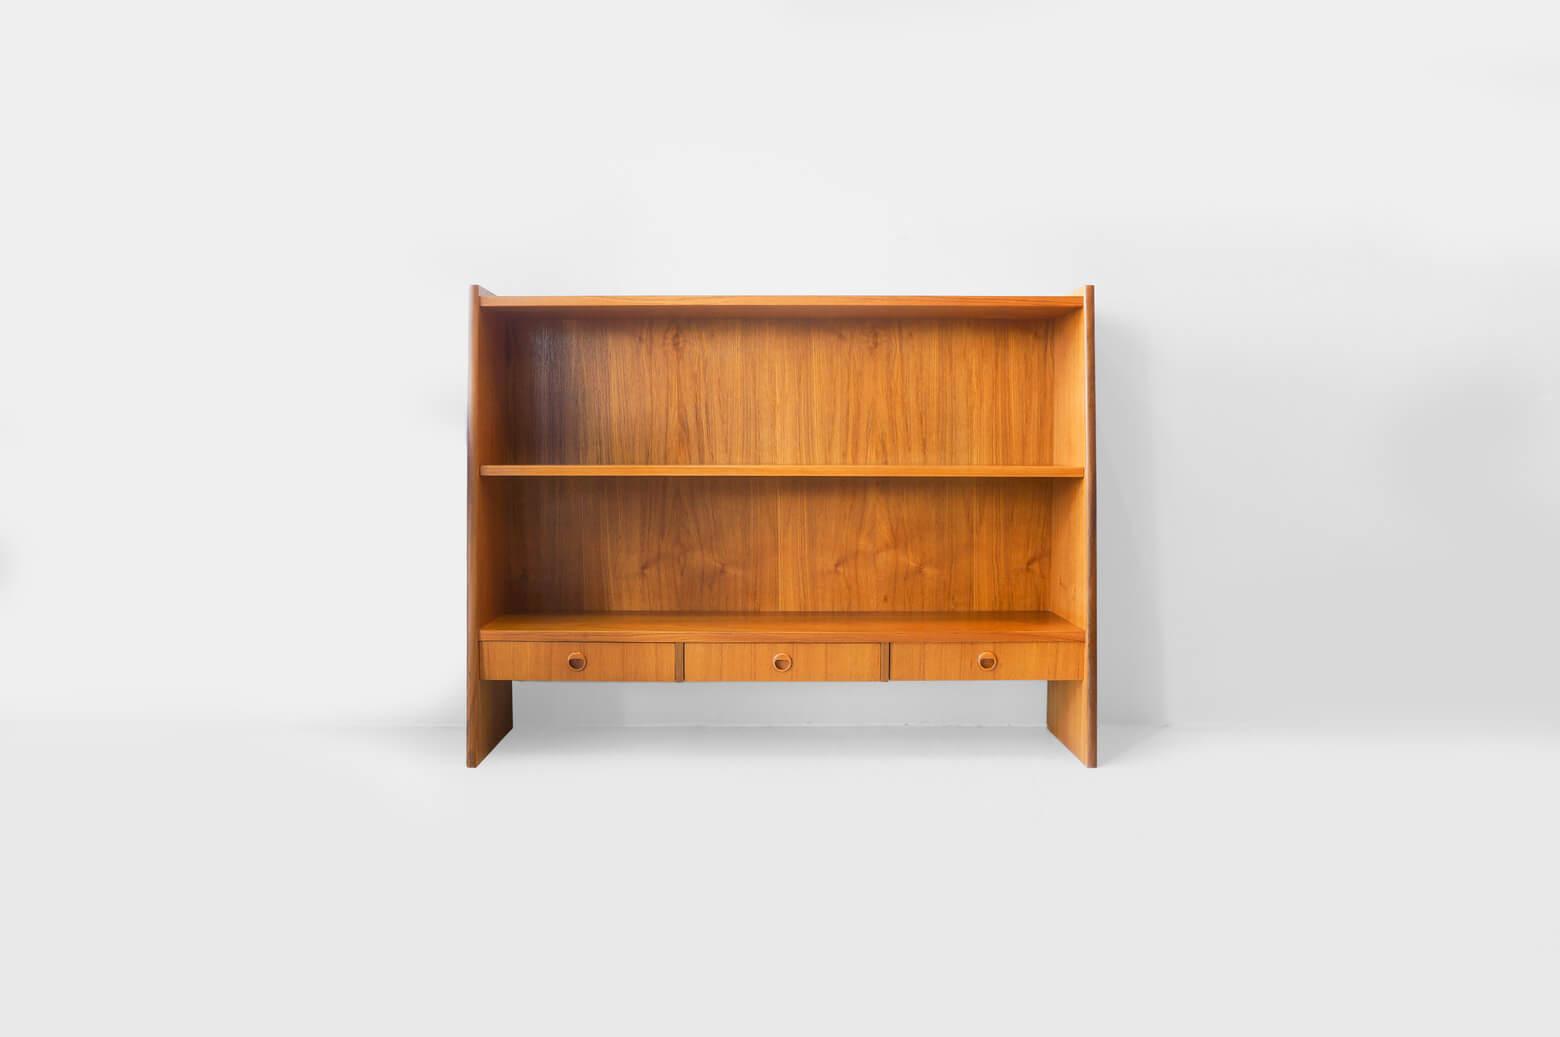 Swedish Vintage Book Case System Shelf/スウェーデン ヴィンテージ ブックケース システムシェルフ